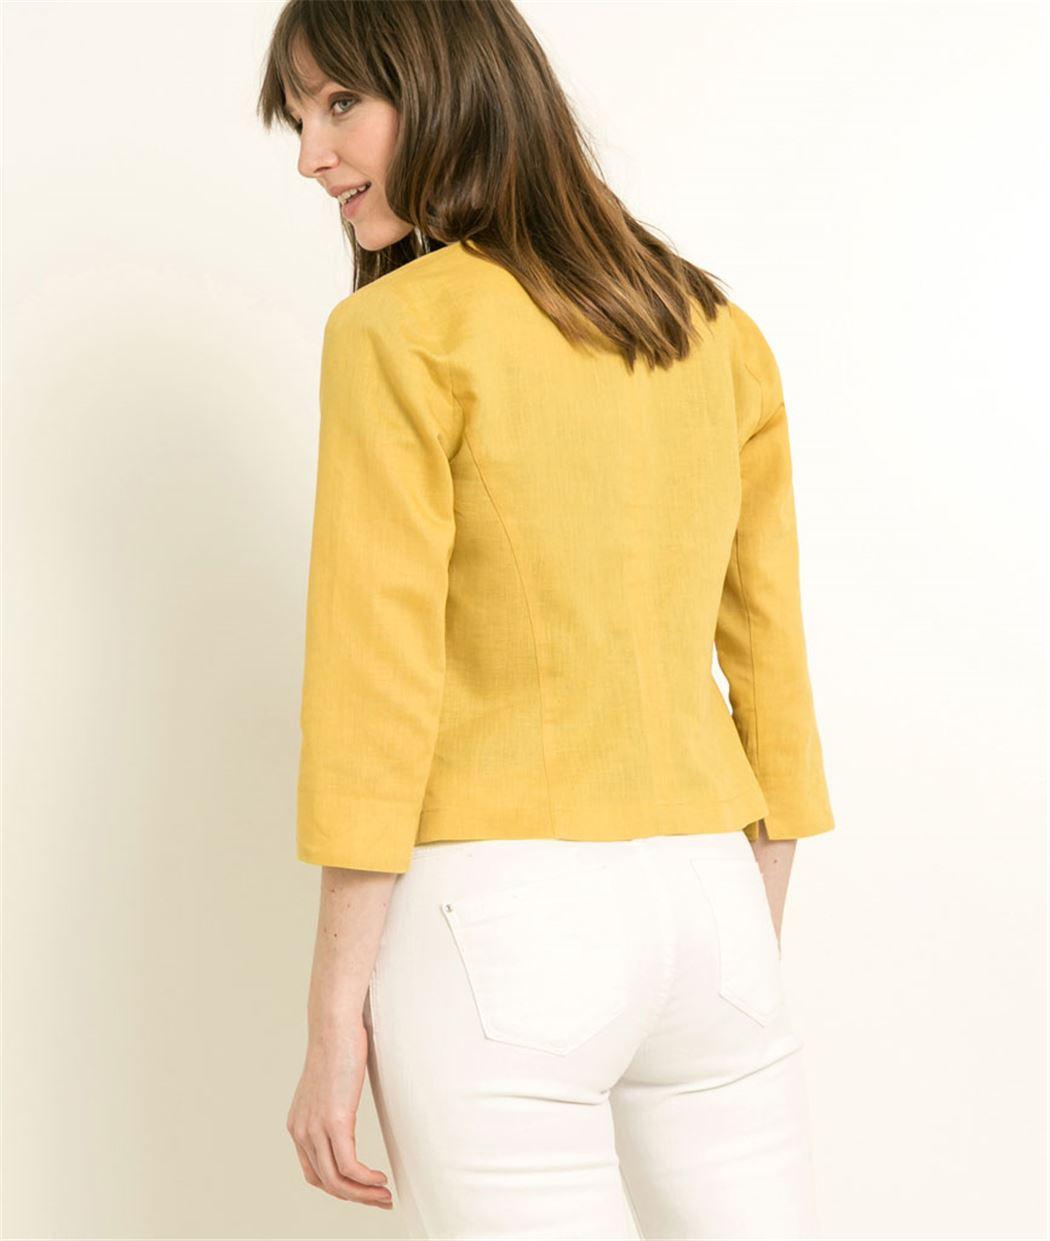 Veste jaune grain de malice